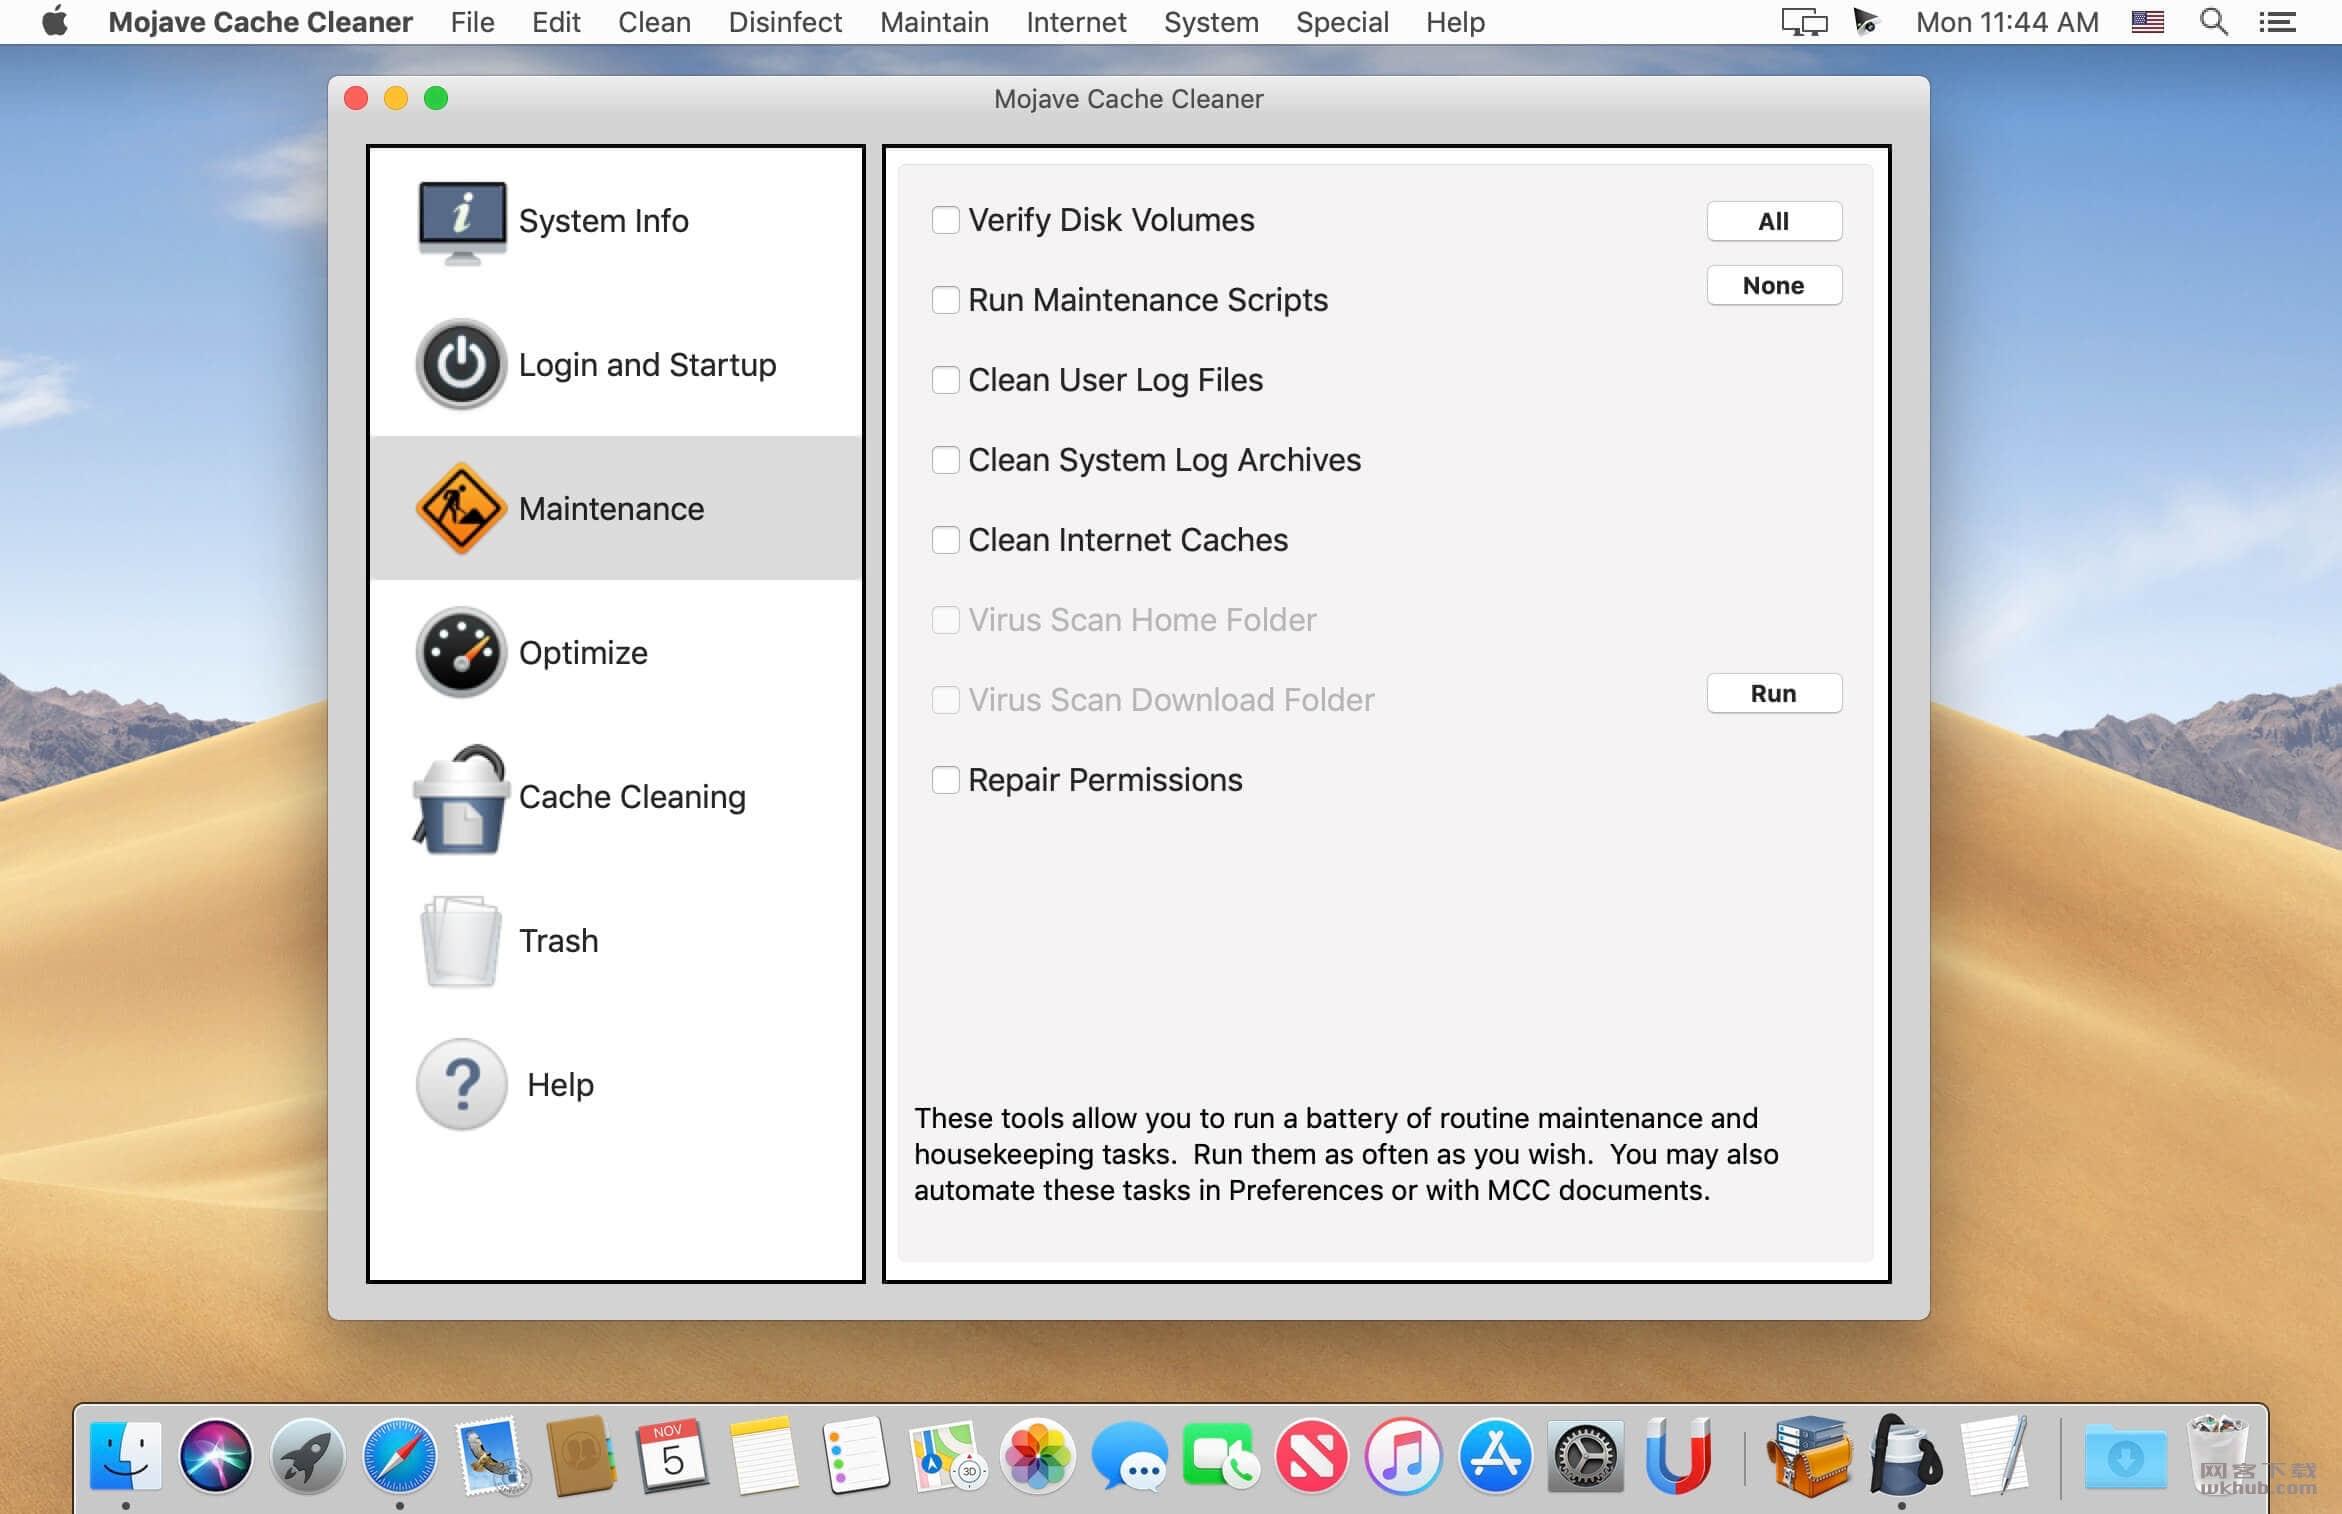 Mojave Cache Cleaner 12.0.4 易用的系统维护工具